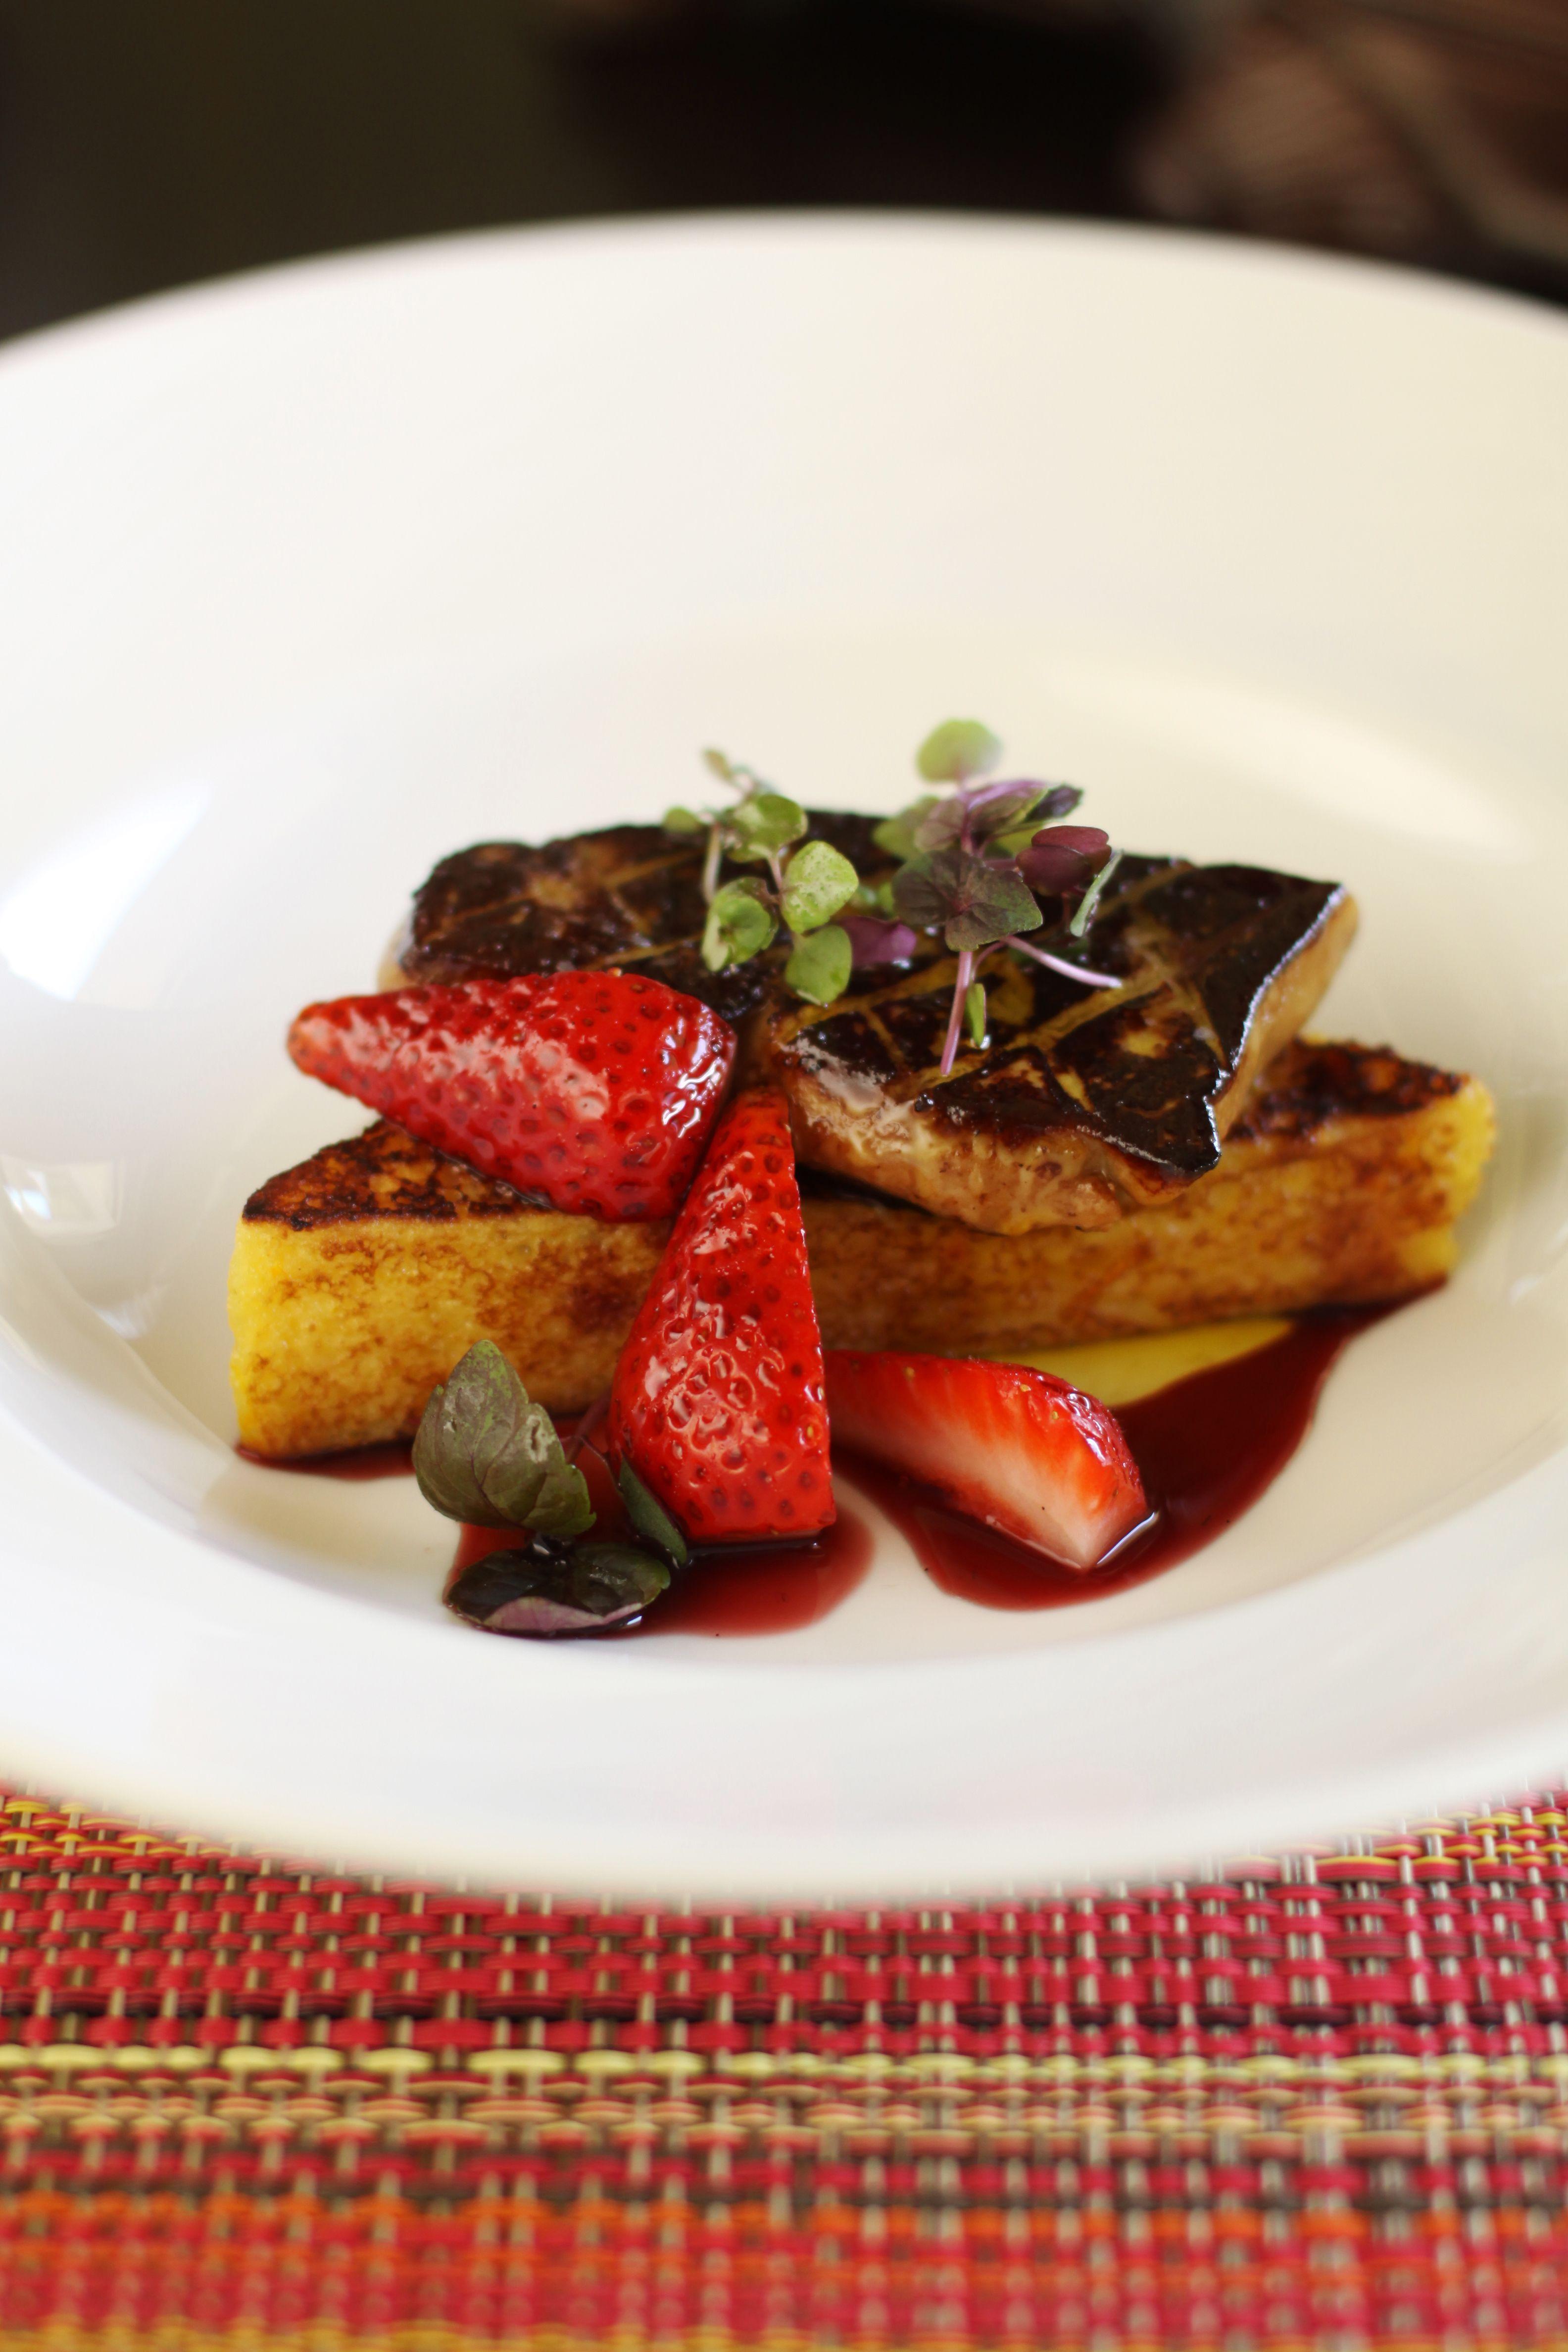 Hudson Valley Fois Gras Grand Marnier French Toast Kula Strawberries Red Wine Vanilla Reduction Tasty Dishes Food Hawaiian Restaurant